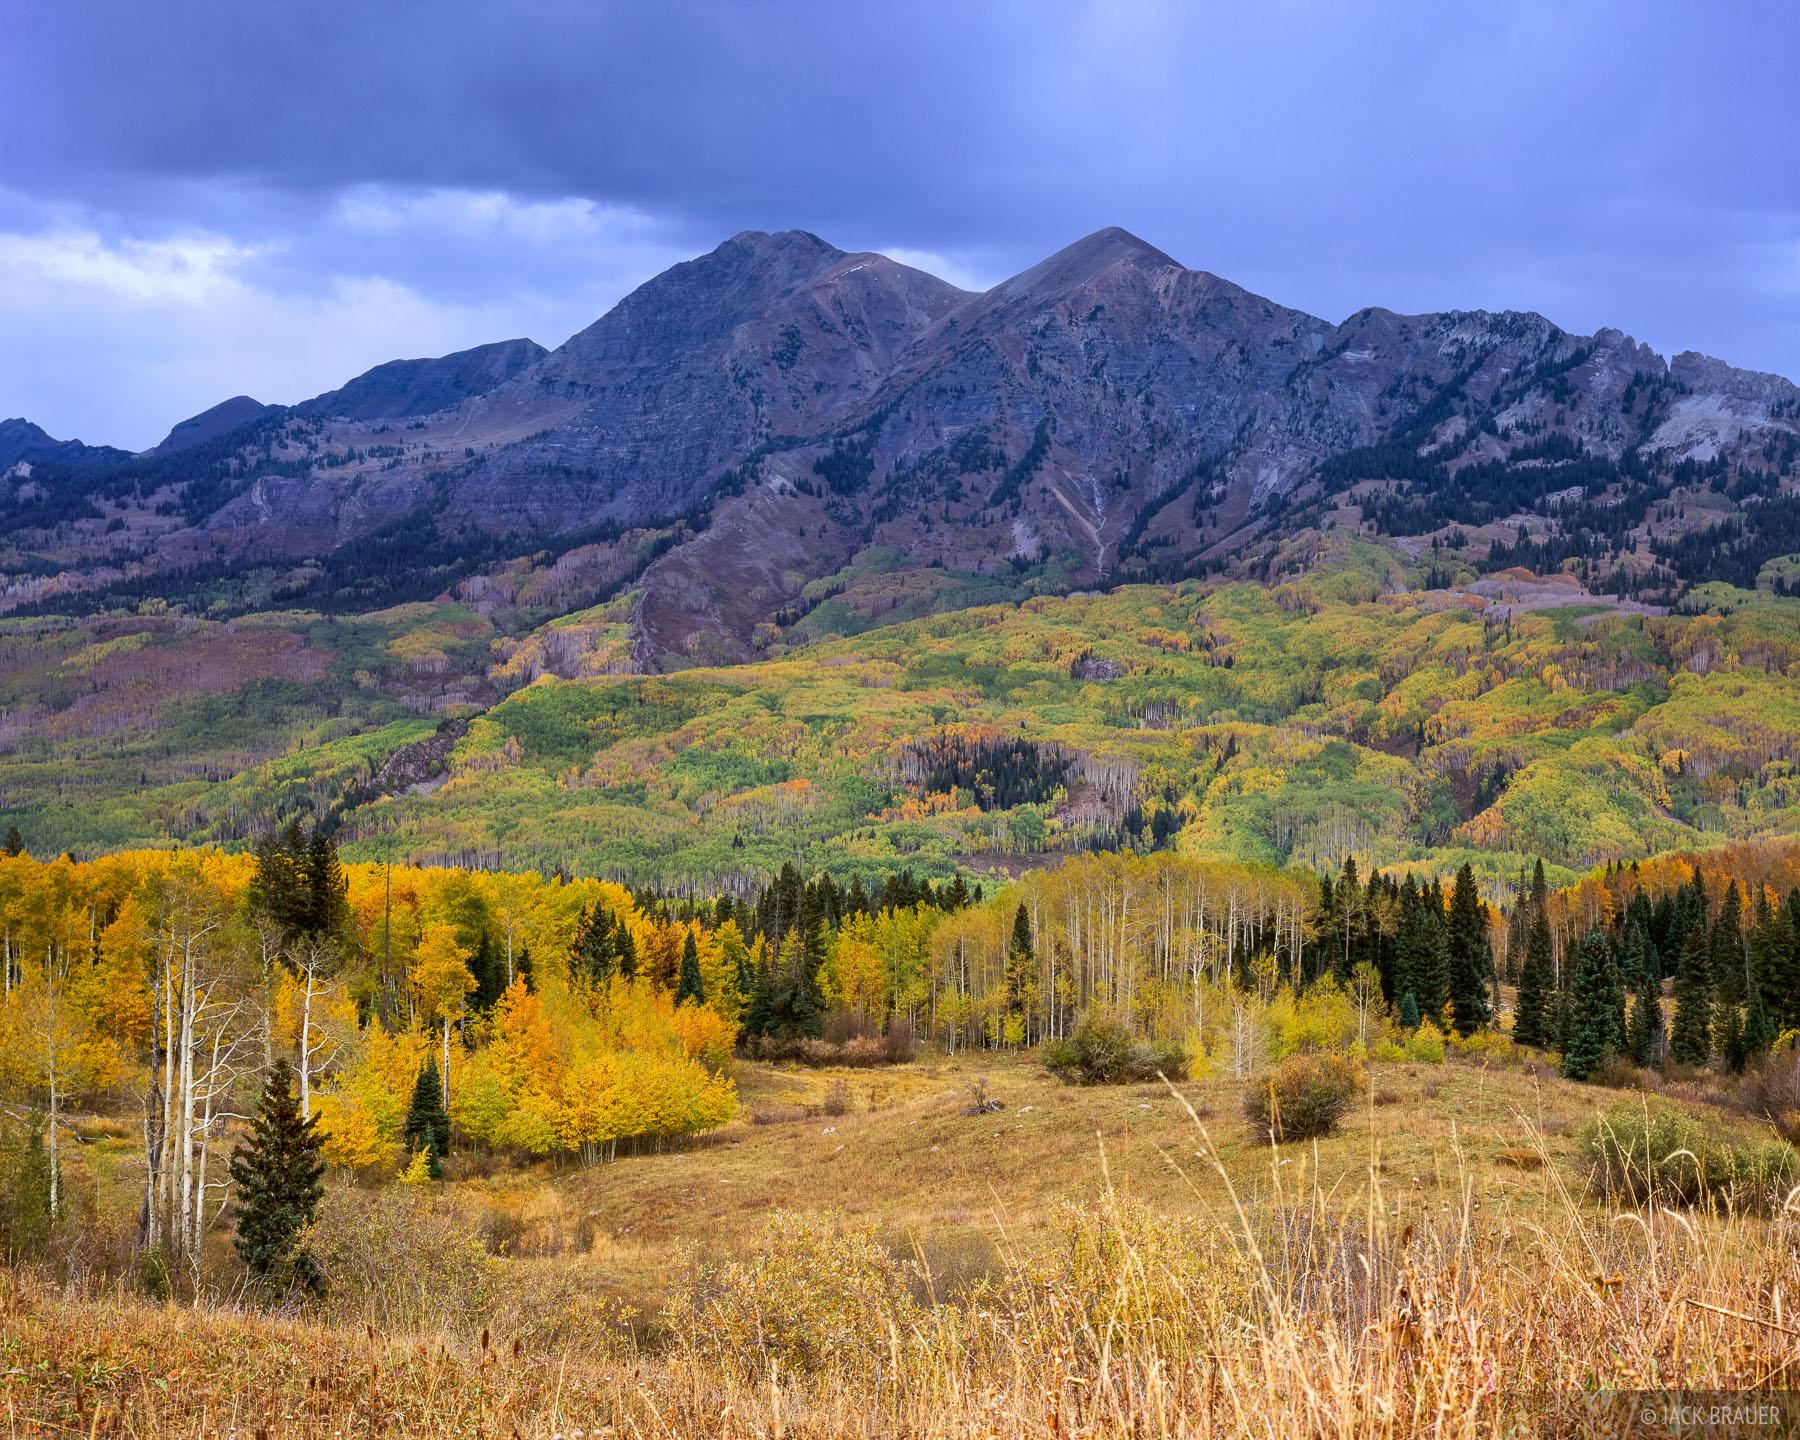 Mt. Owen, Ruby Peak, West Elk Mountains, Colorado, Raggeds Wilderness, photo